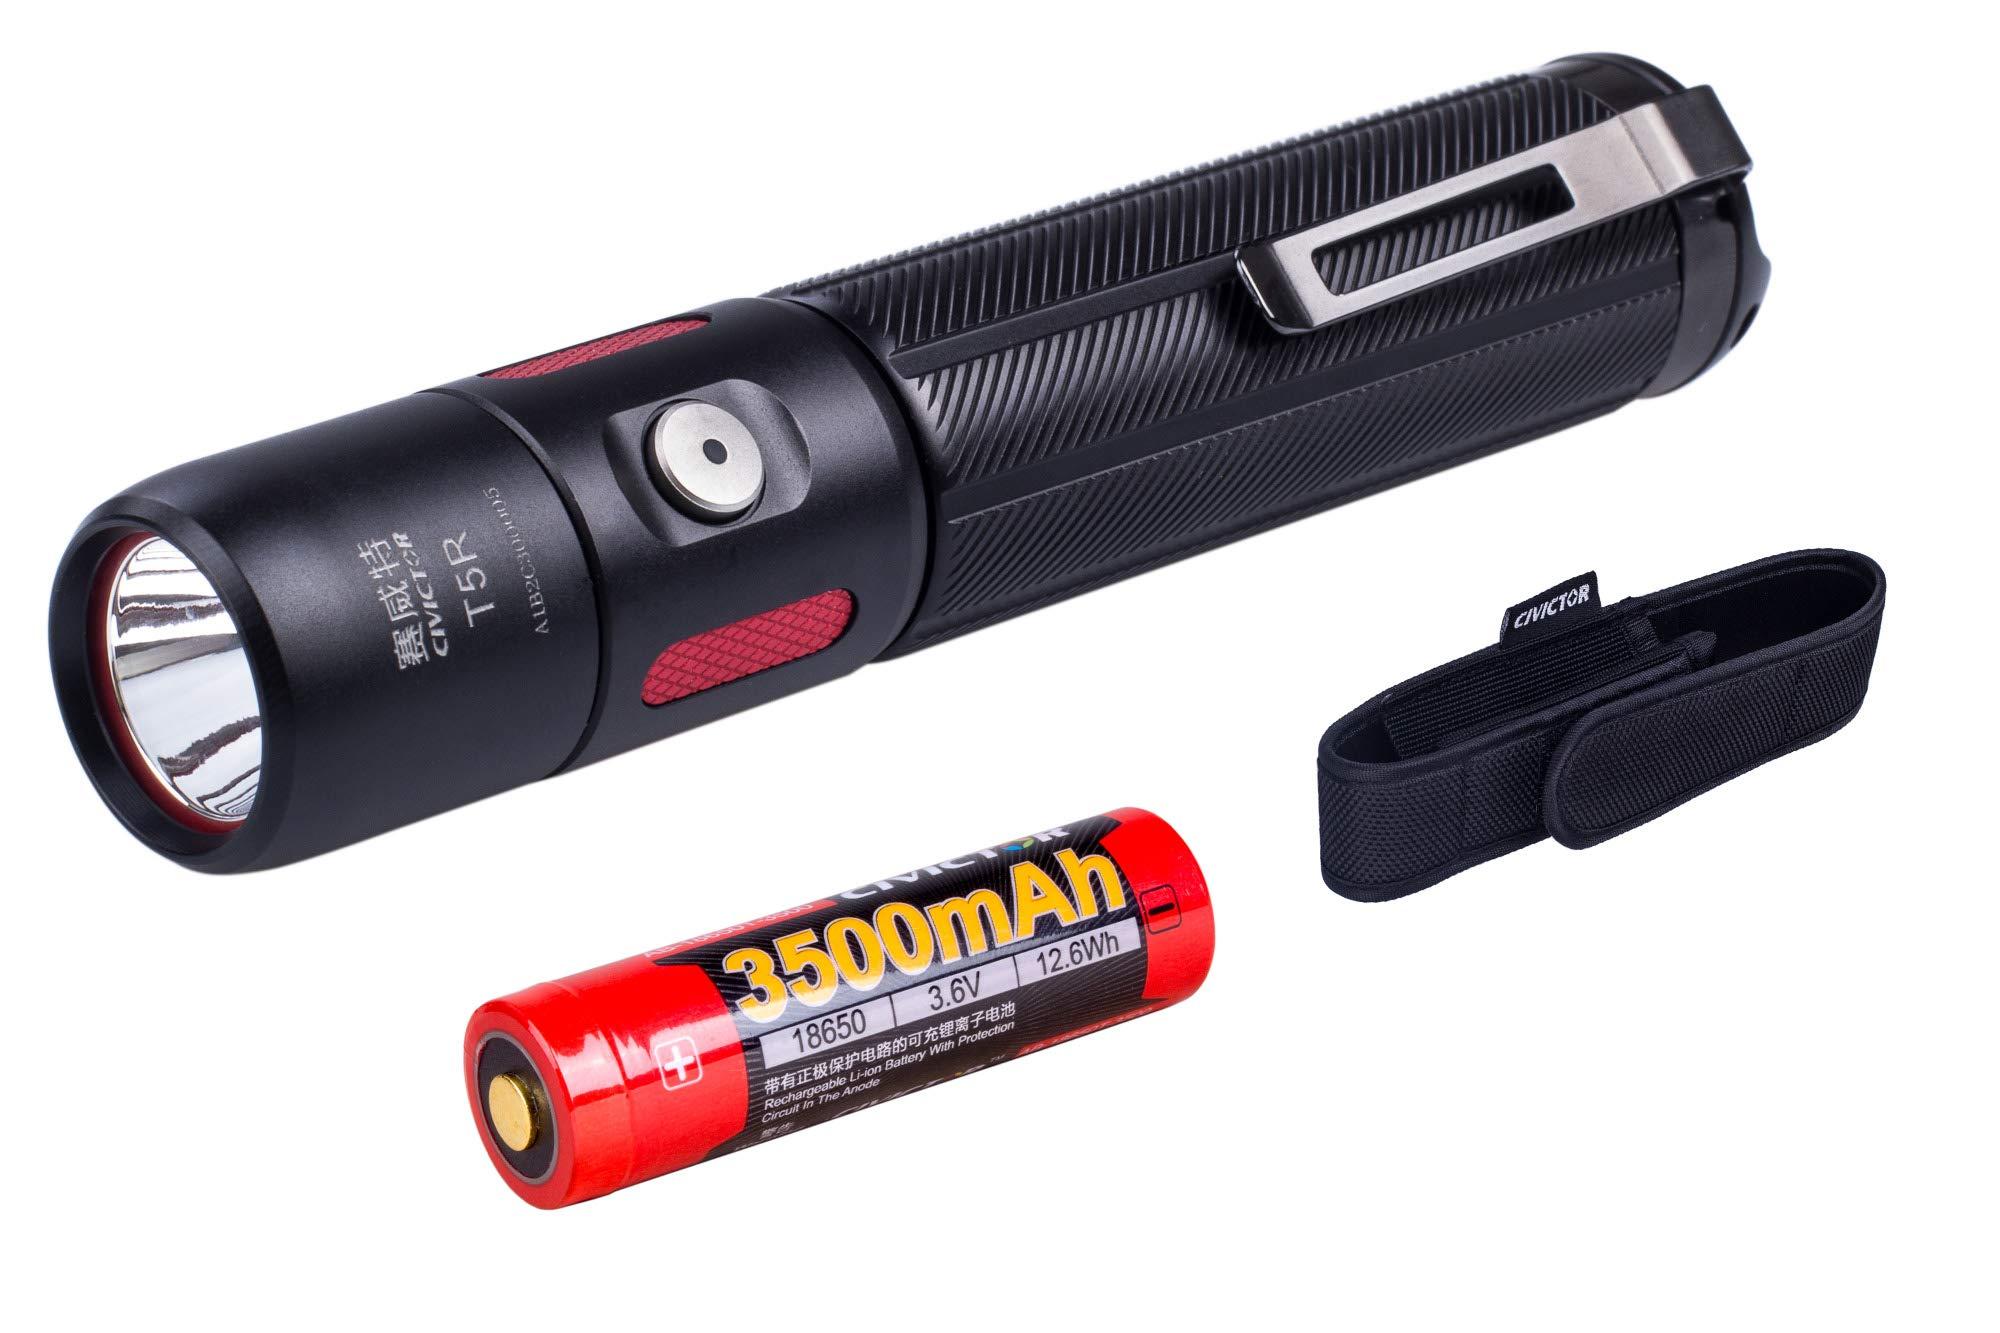 Small USB rechargeable Tactical Flashlight 1000 Lumens Led Flashlight Waterproof IPX8 Pocket Flashlight with 18650 Battery